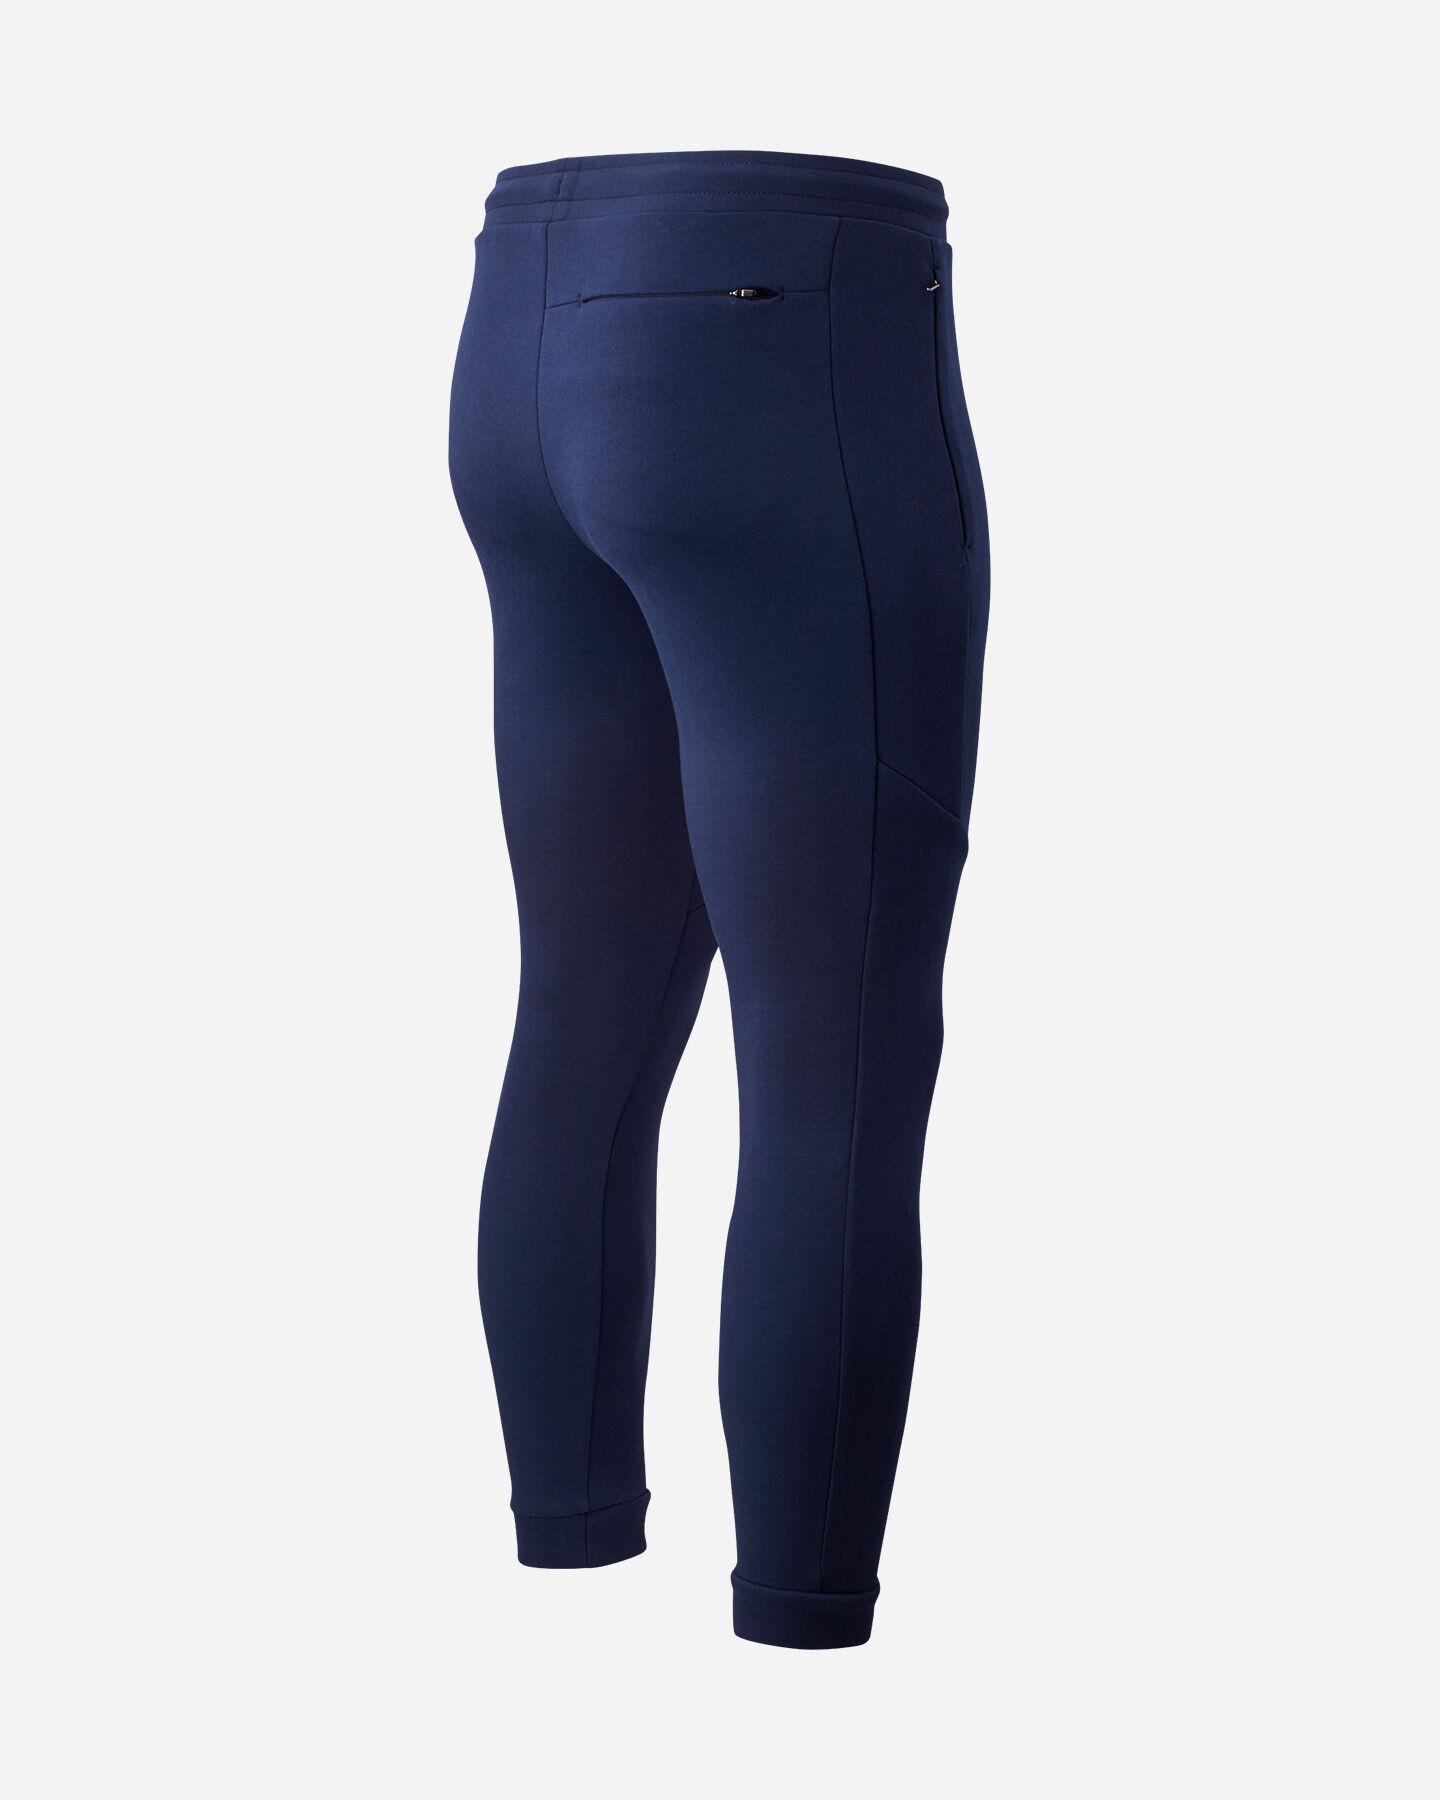 Pantalone NEW BALANCE CORE SLIM M S5166132 scatto 1